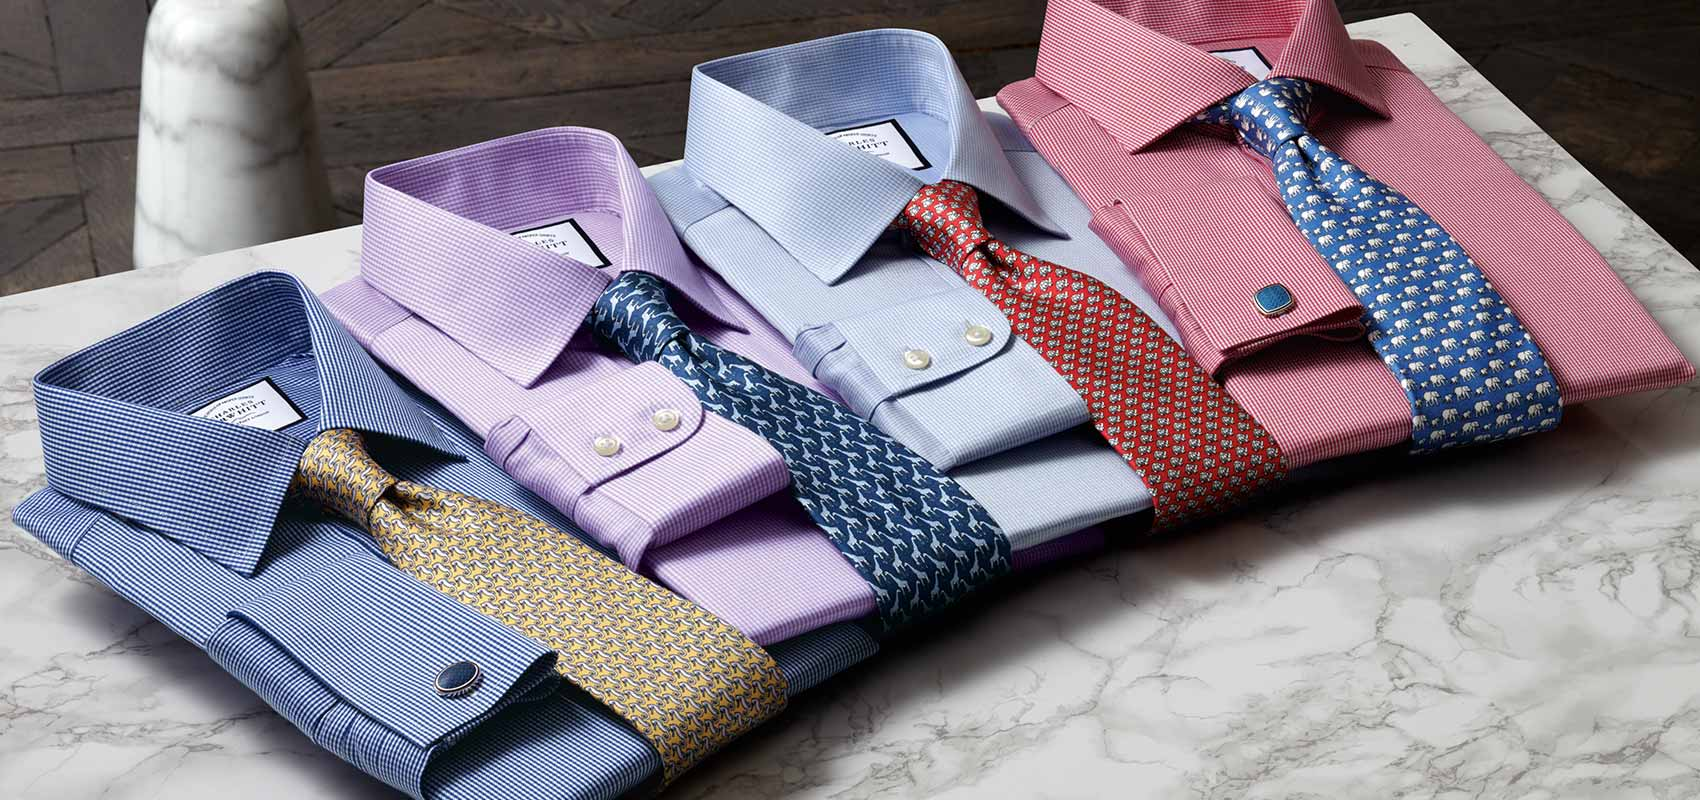 Charles Tyrwhitt puppytooth shirts